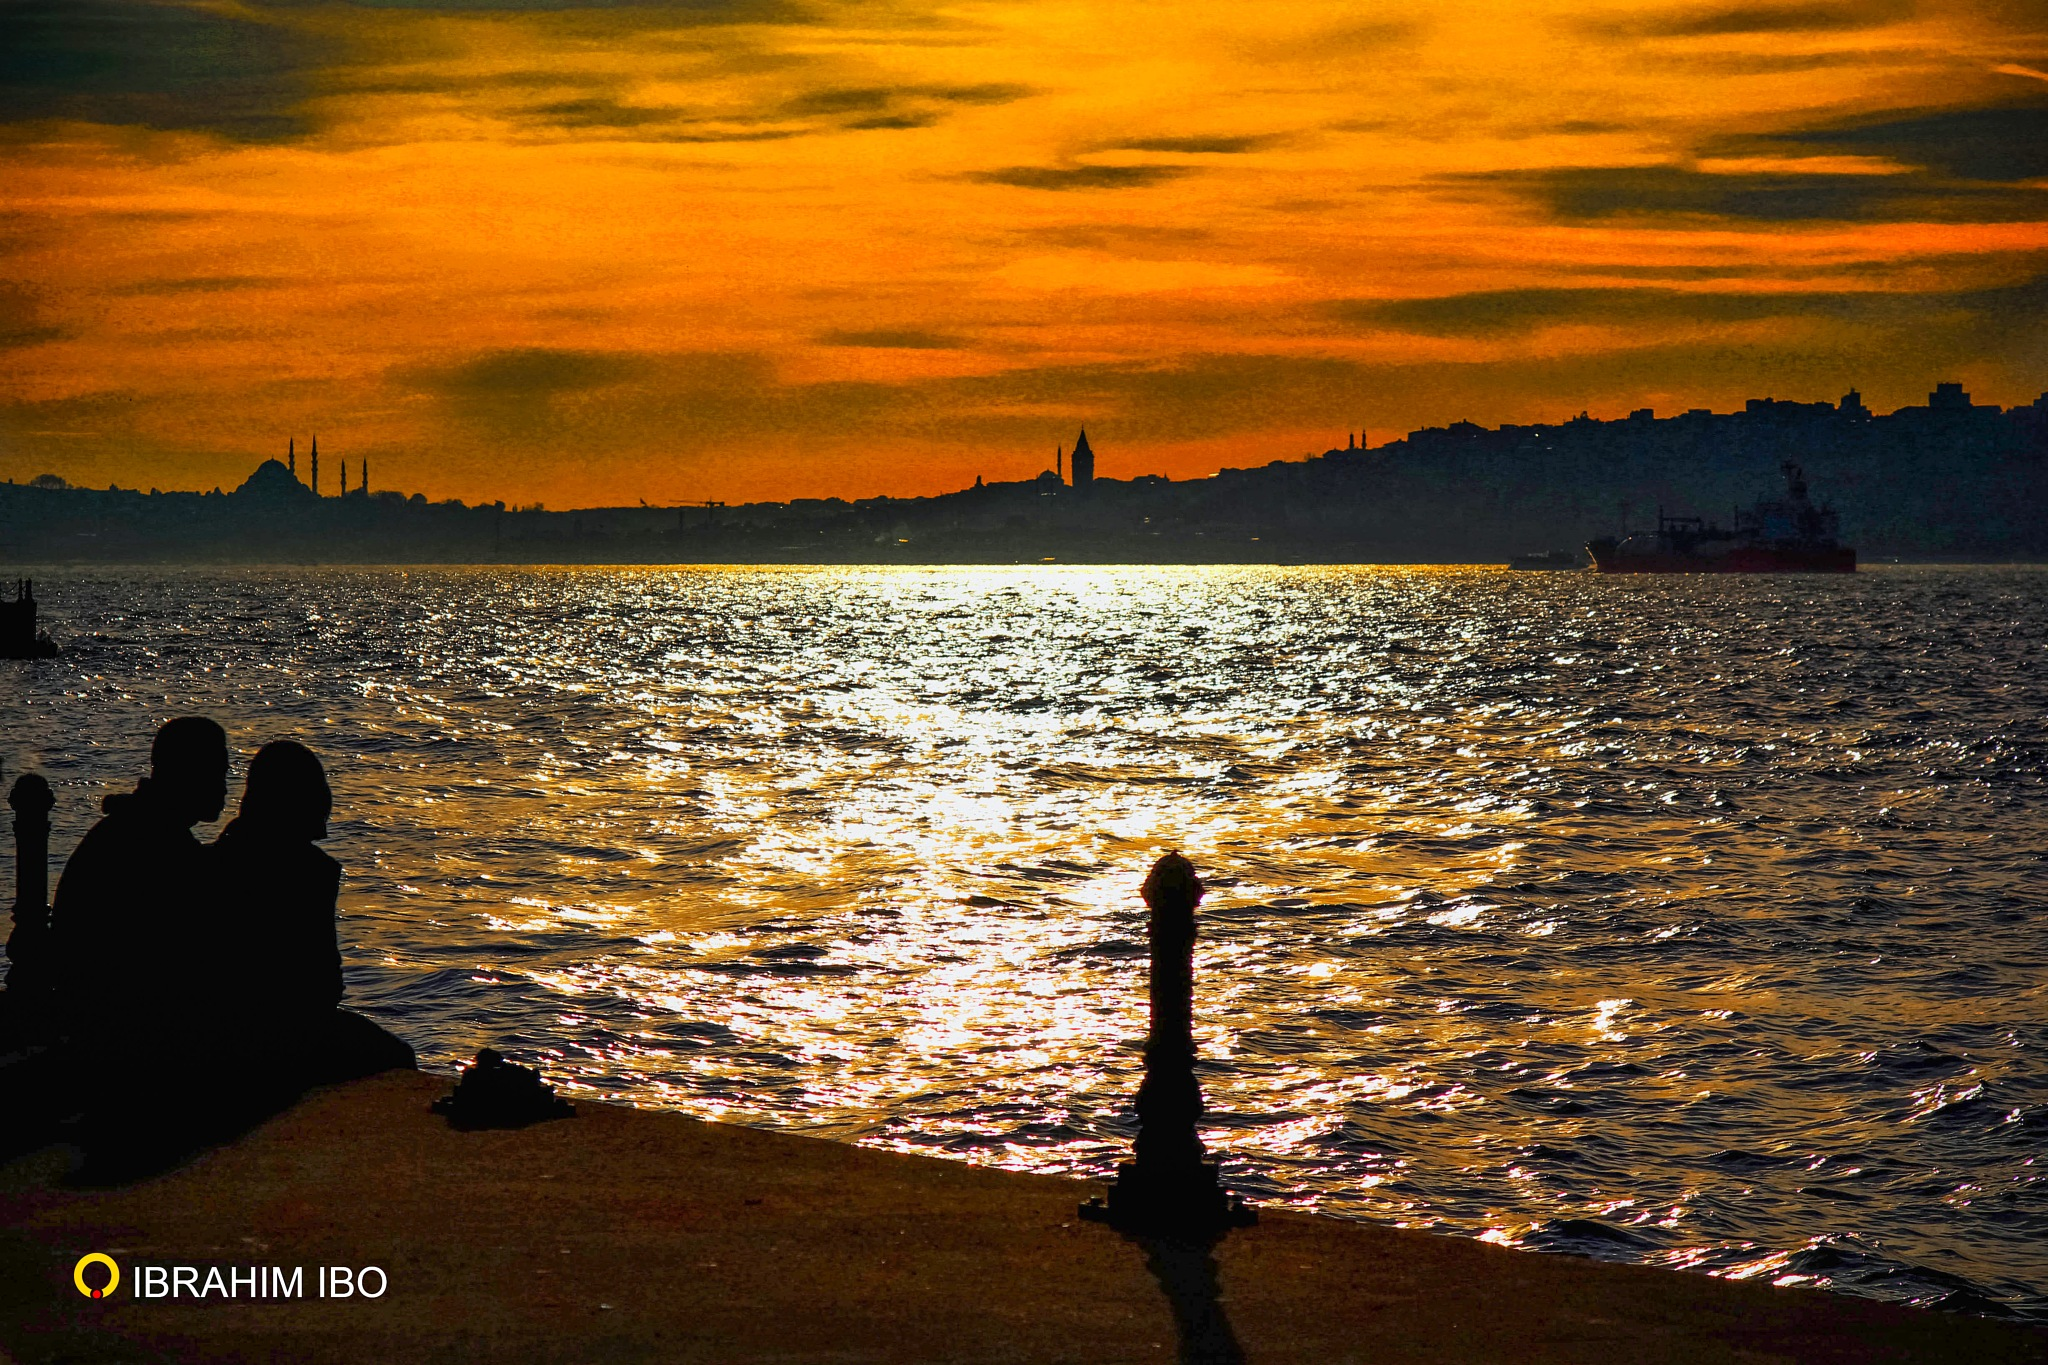 Istanbul by IBRAHIM IBO